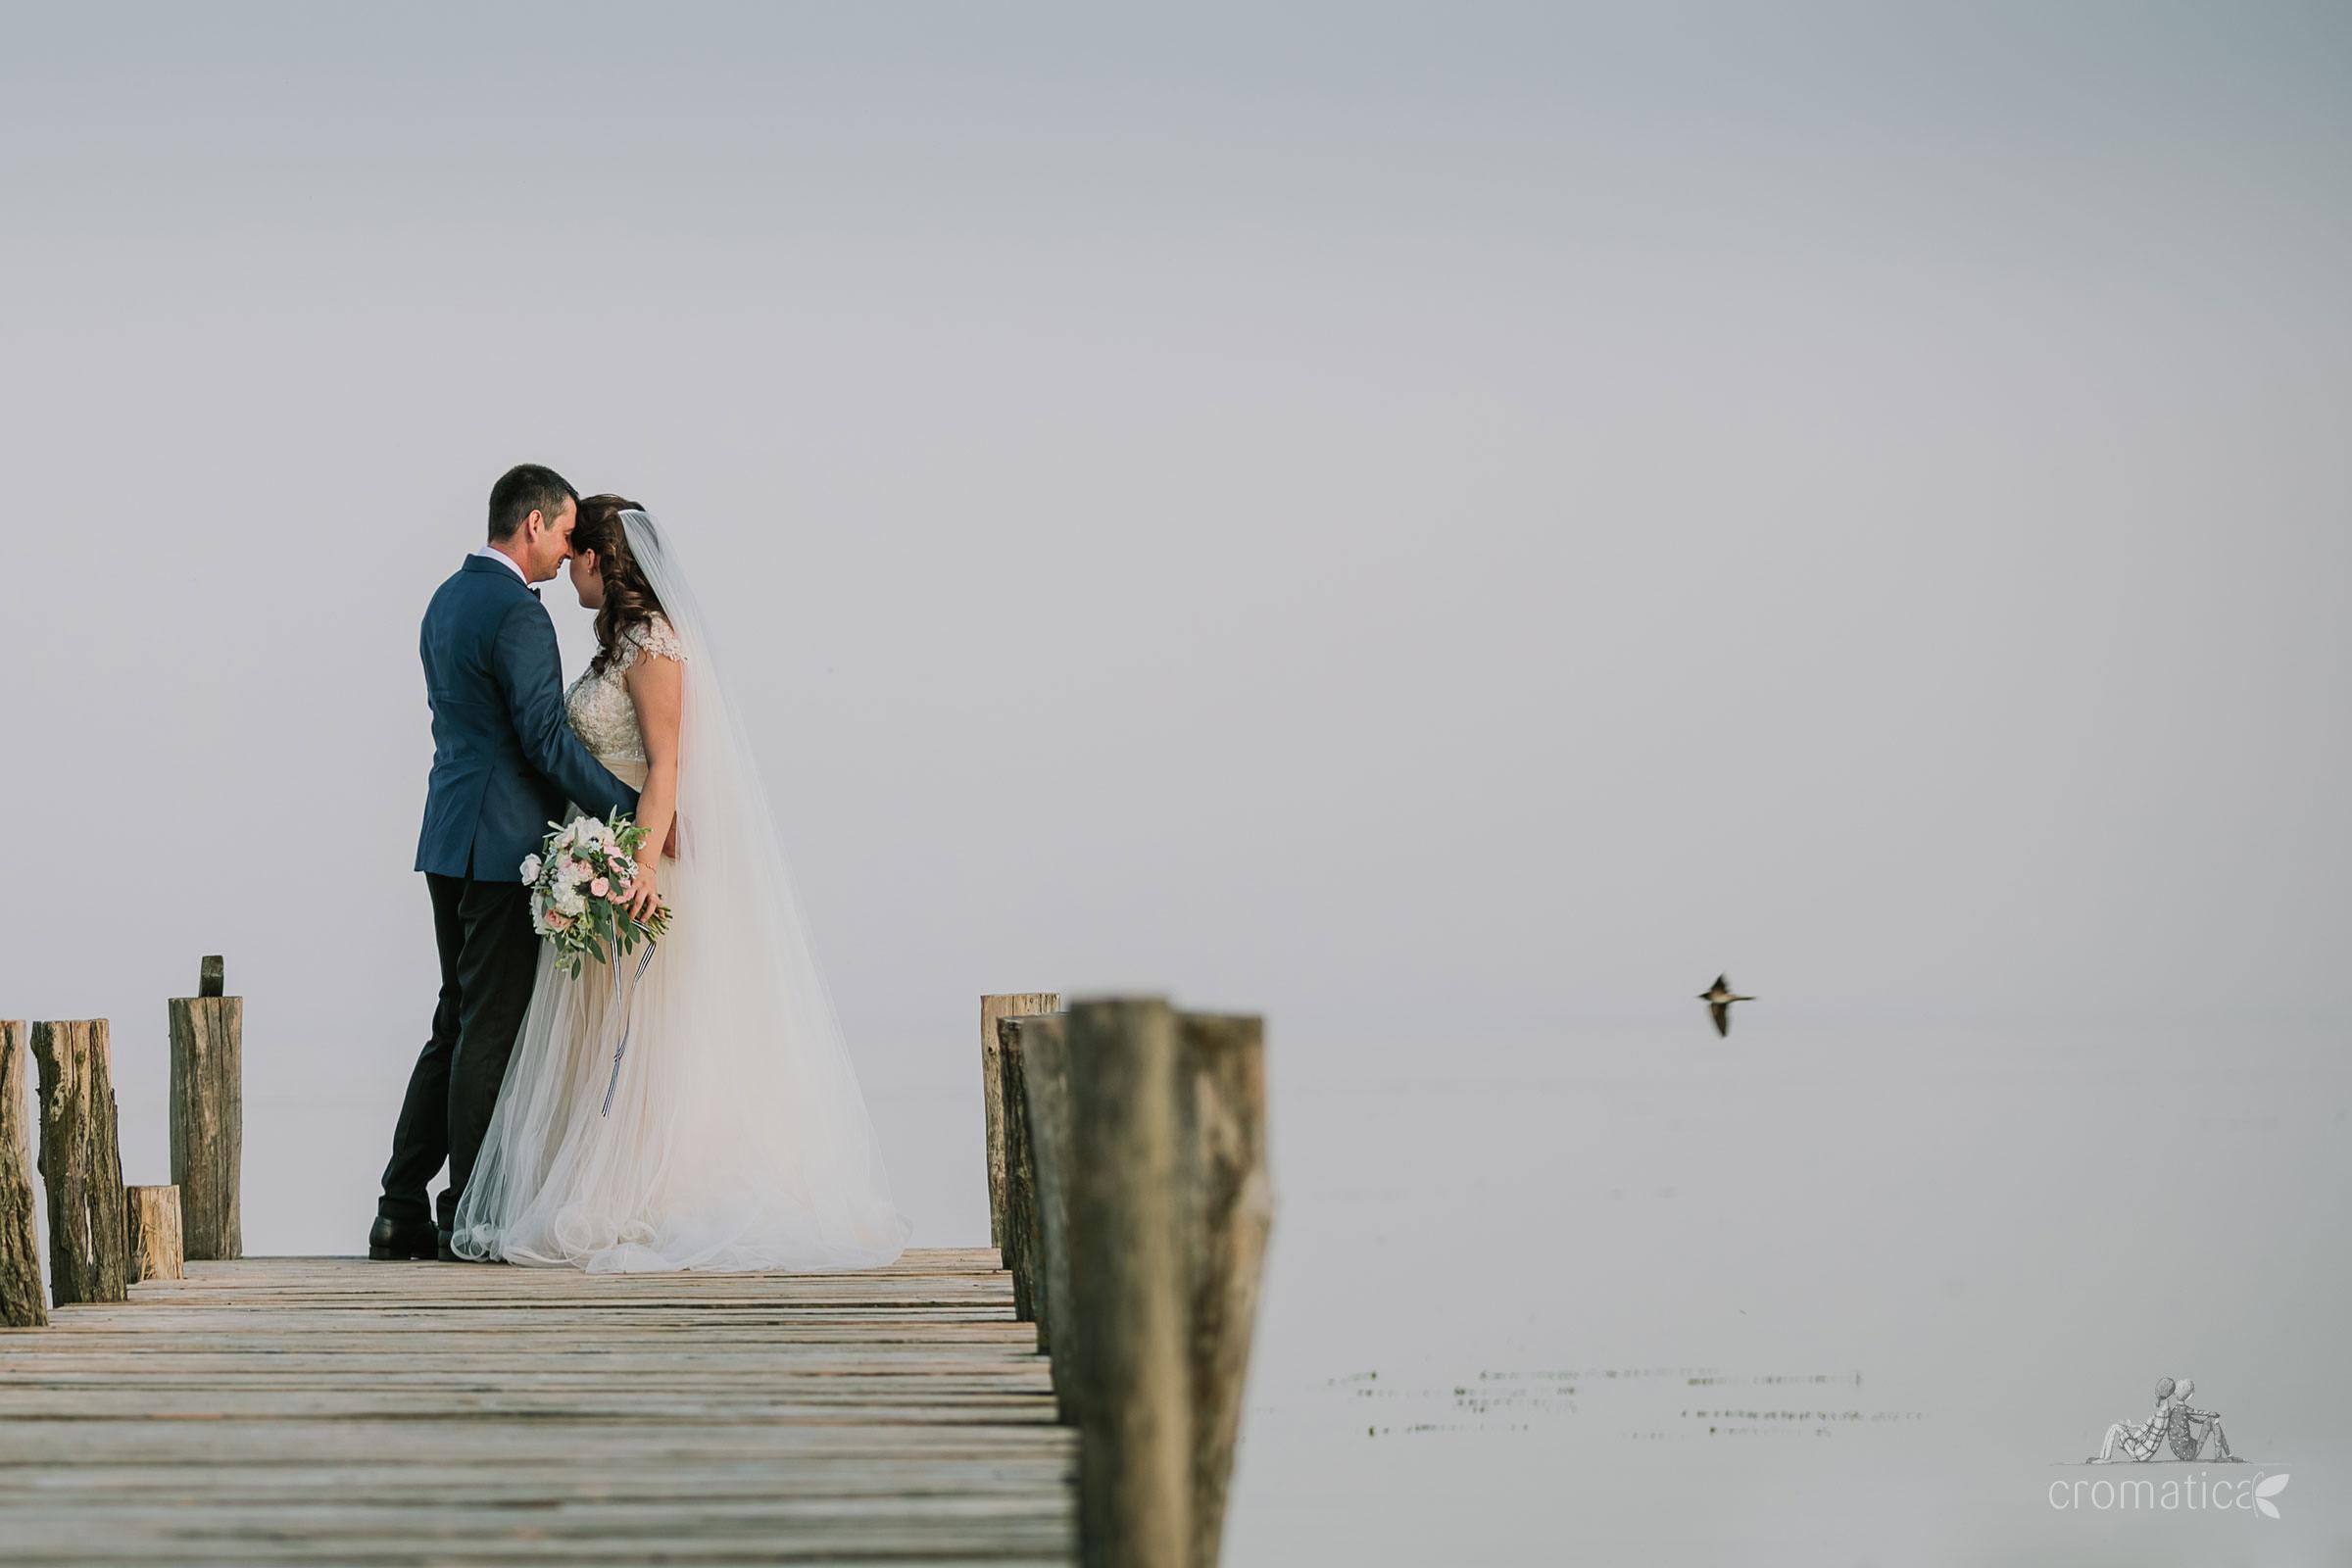 giorgiana constantin fotografii nunta delta royal delta dunarii 048